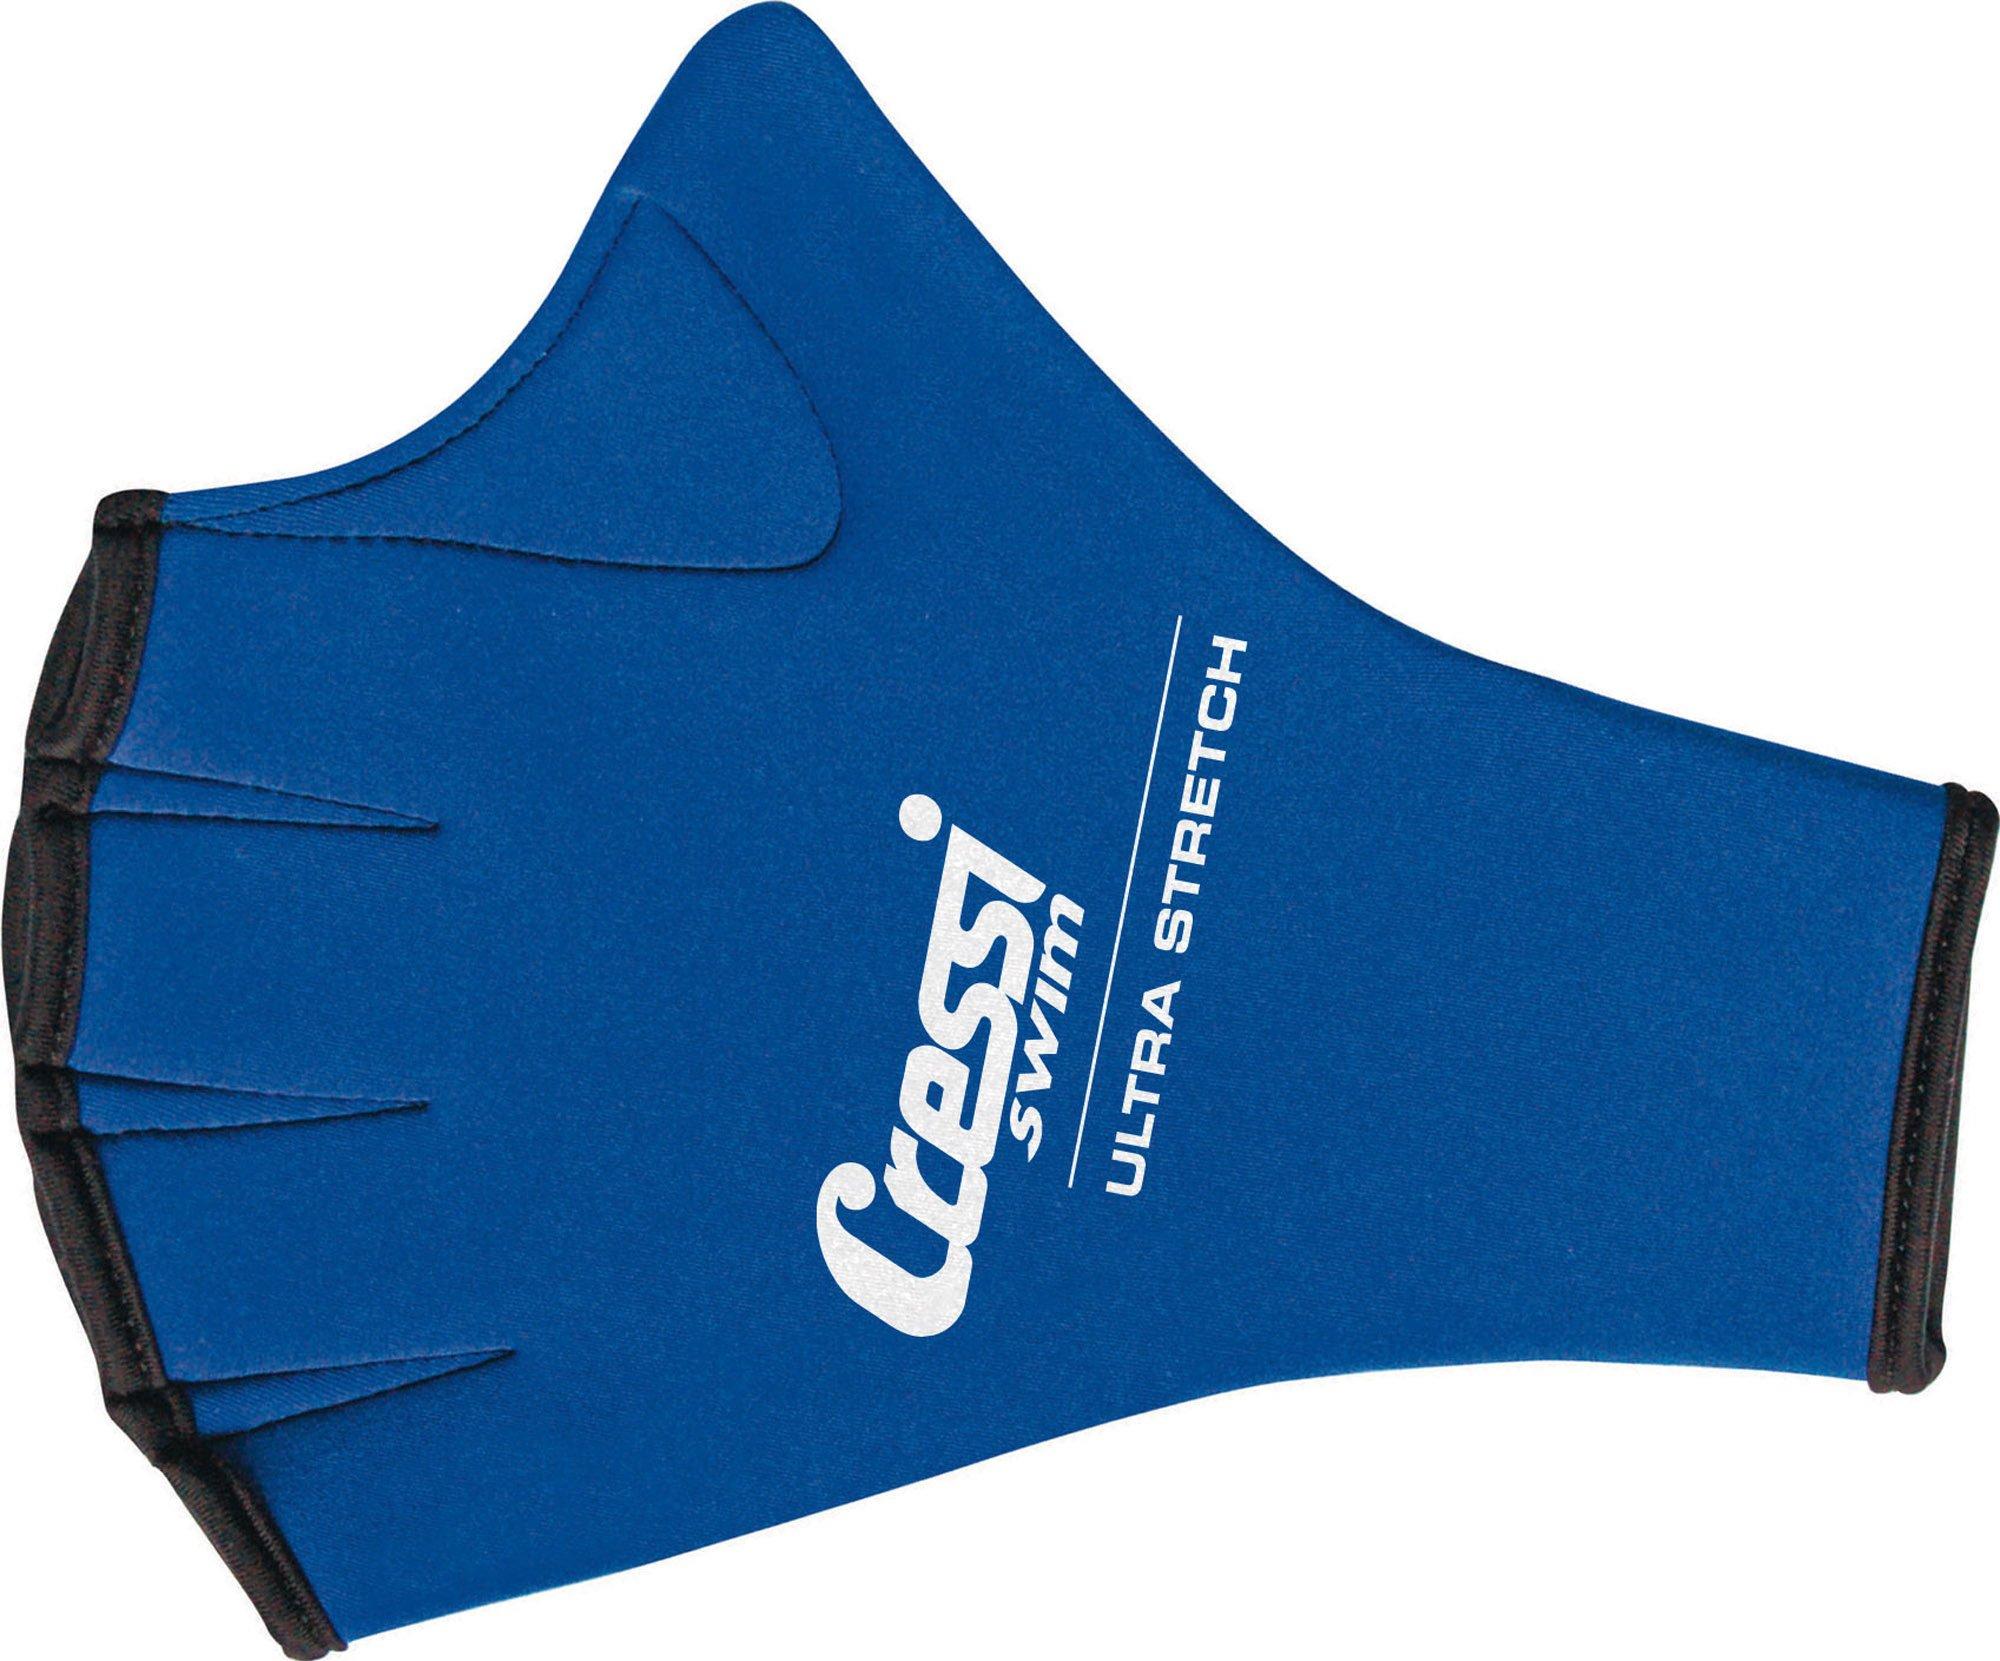 Cressi Slim Webbed Gloves for Swimming and Training - Blue, Medium